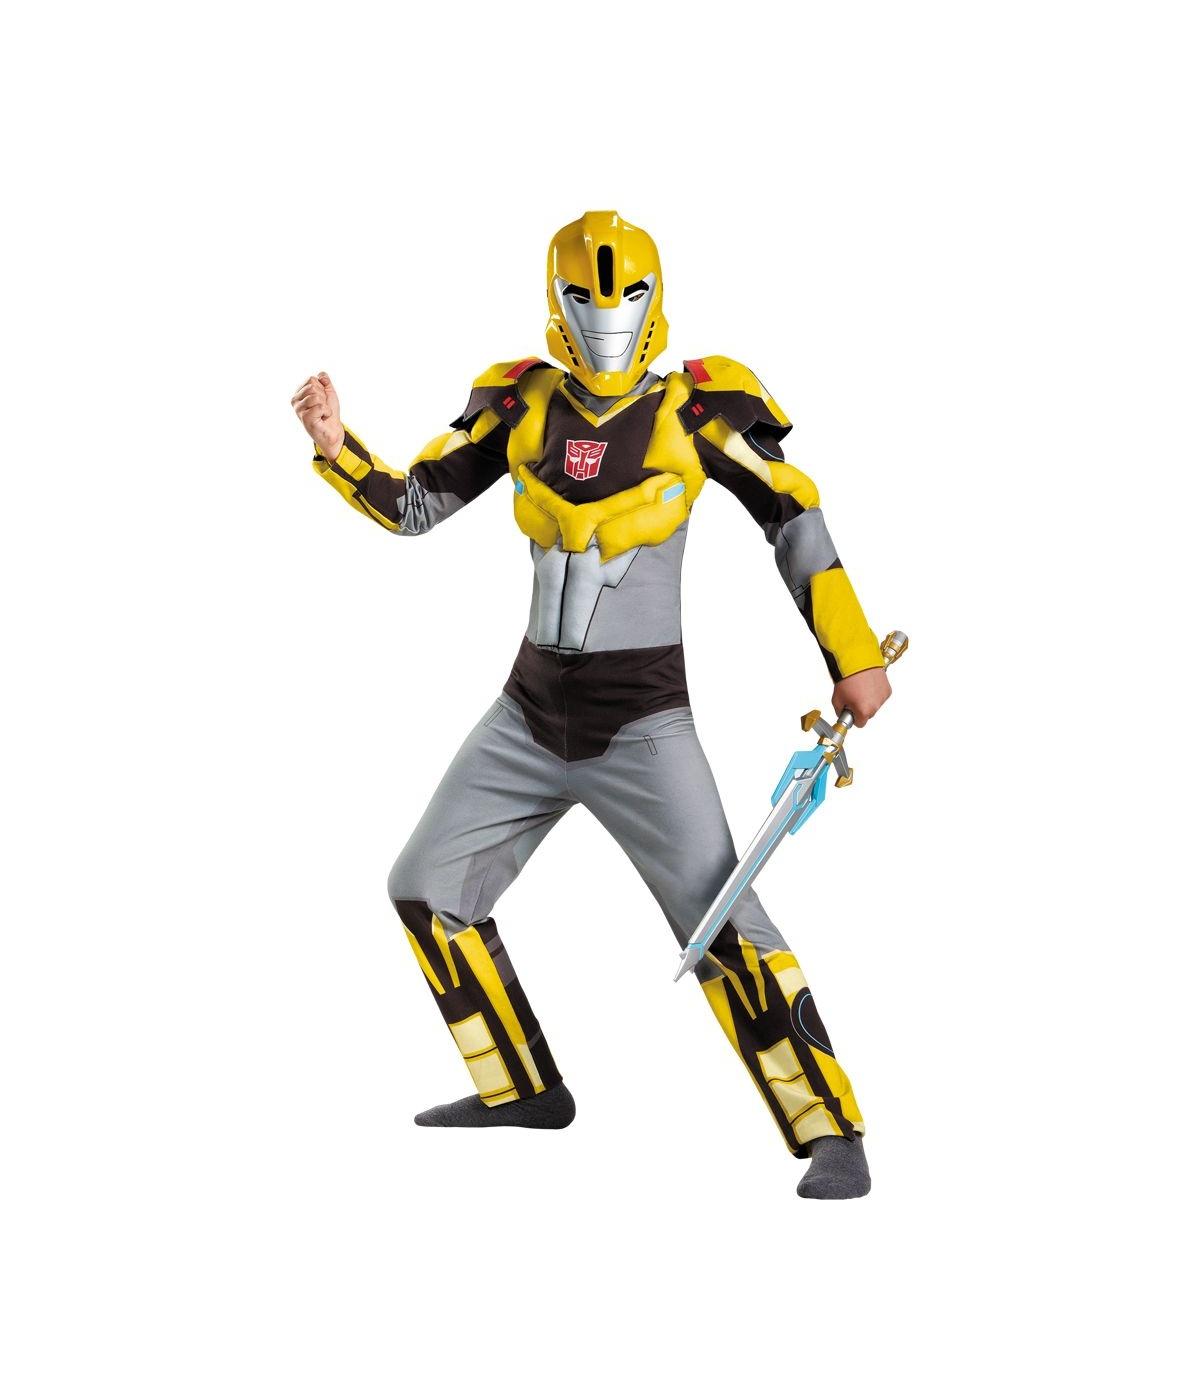 Transformers Bumblebee Muscle Boys Costume Superhero Costume